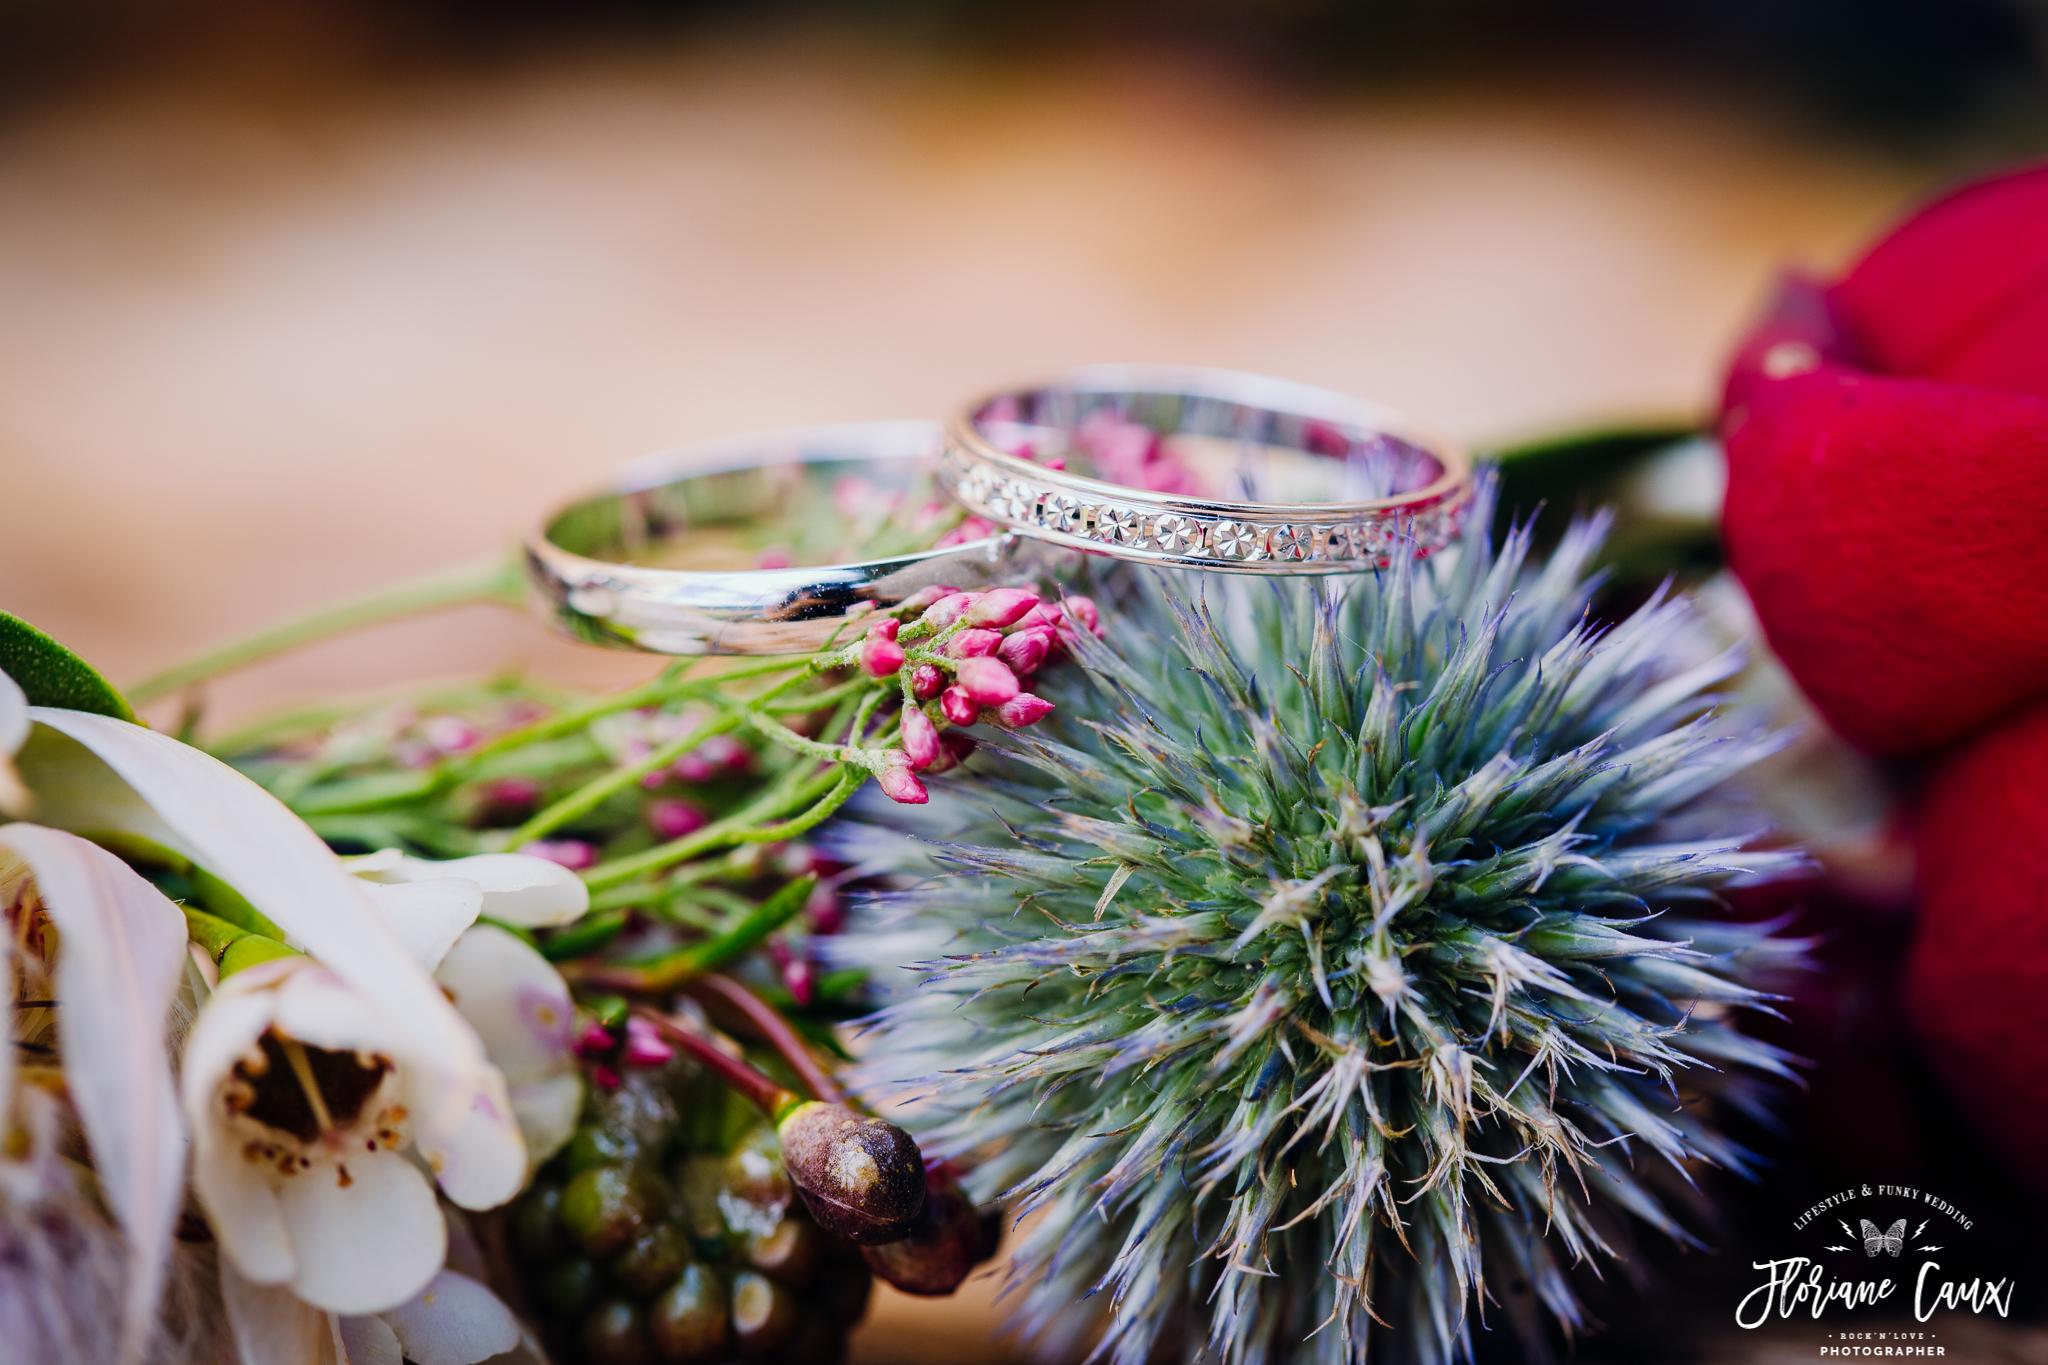 photographe-mariage-toulouse-rocknroll-maries-tatoues-floriane-caux-3